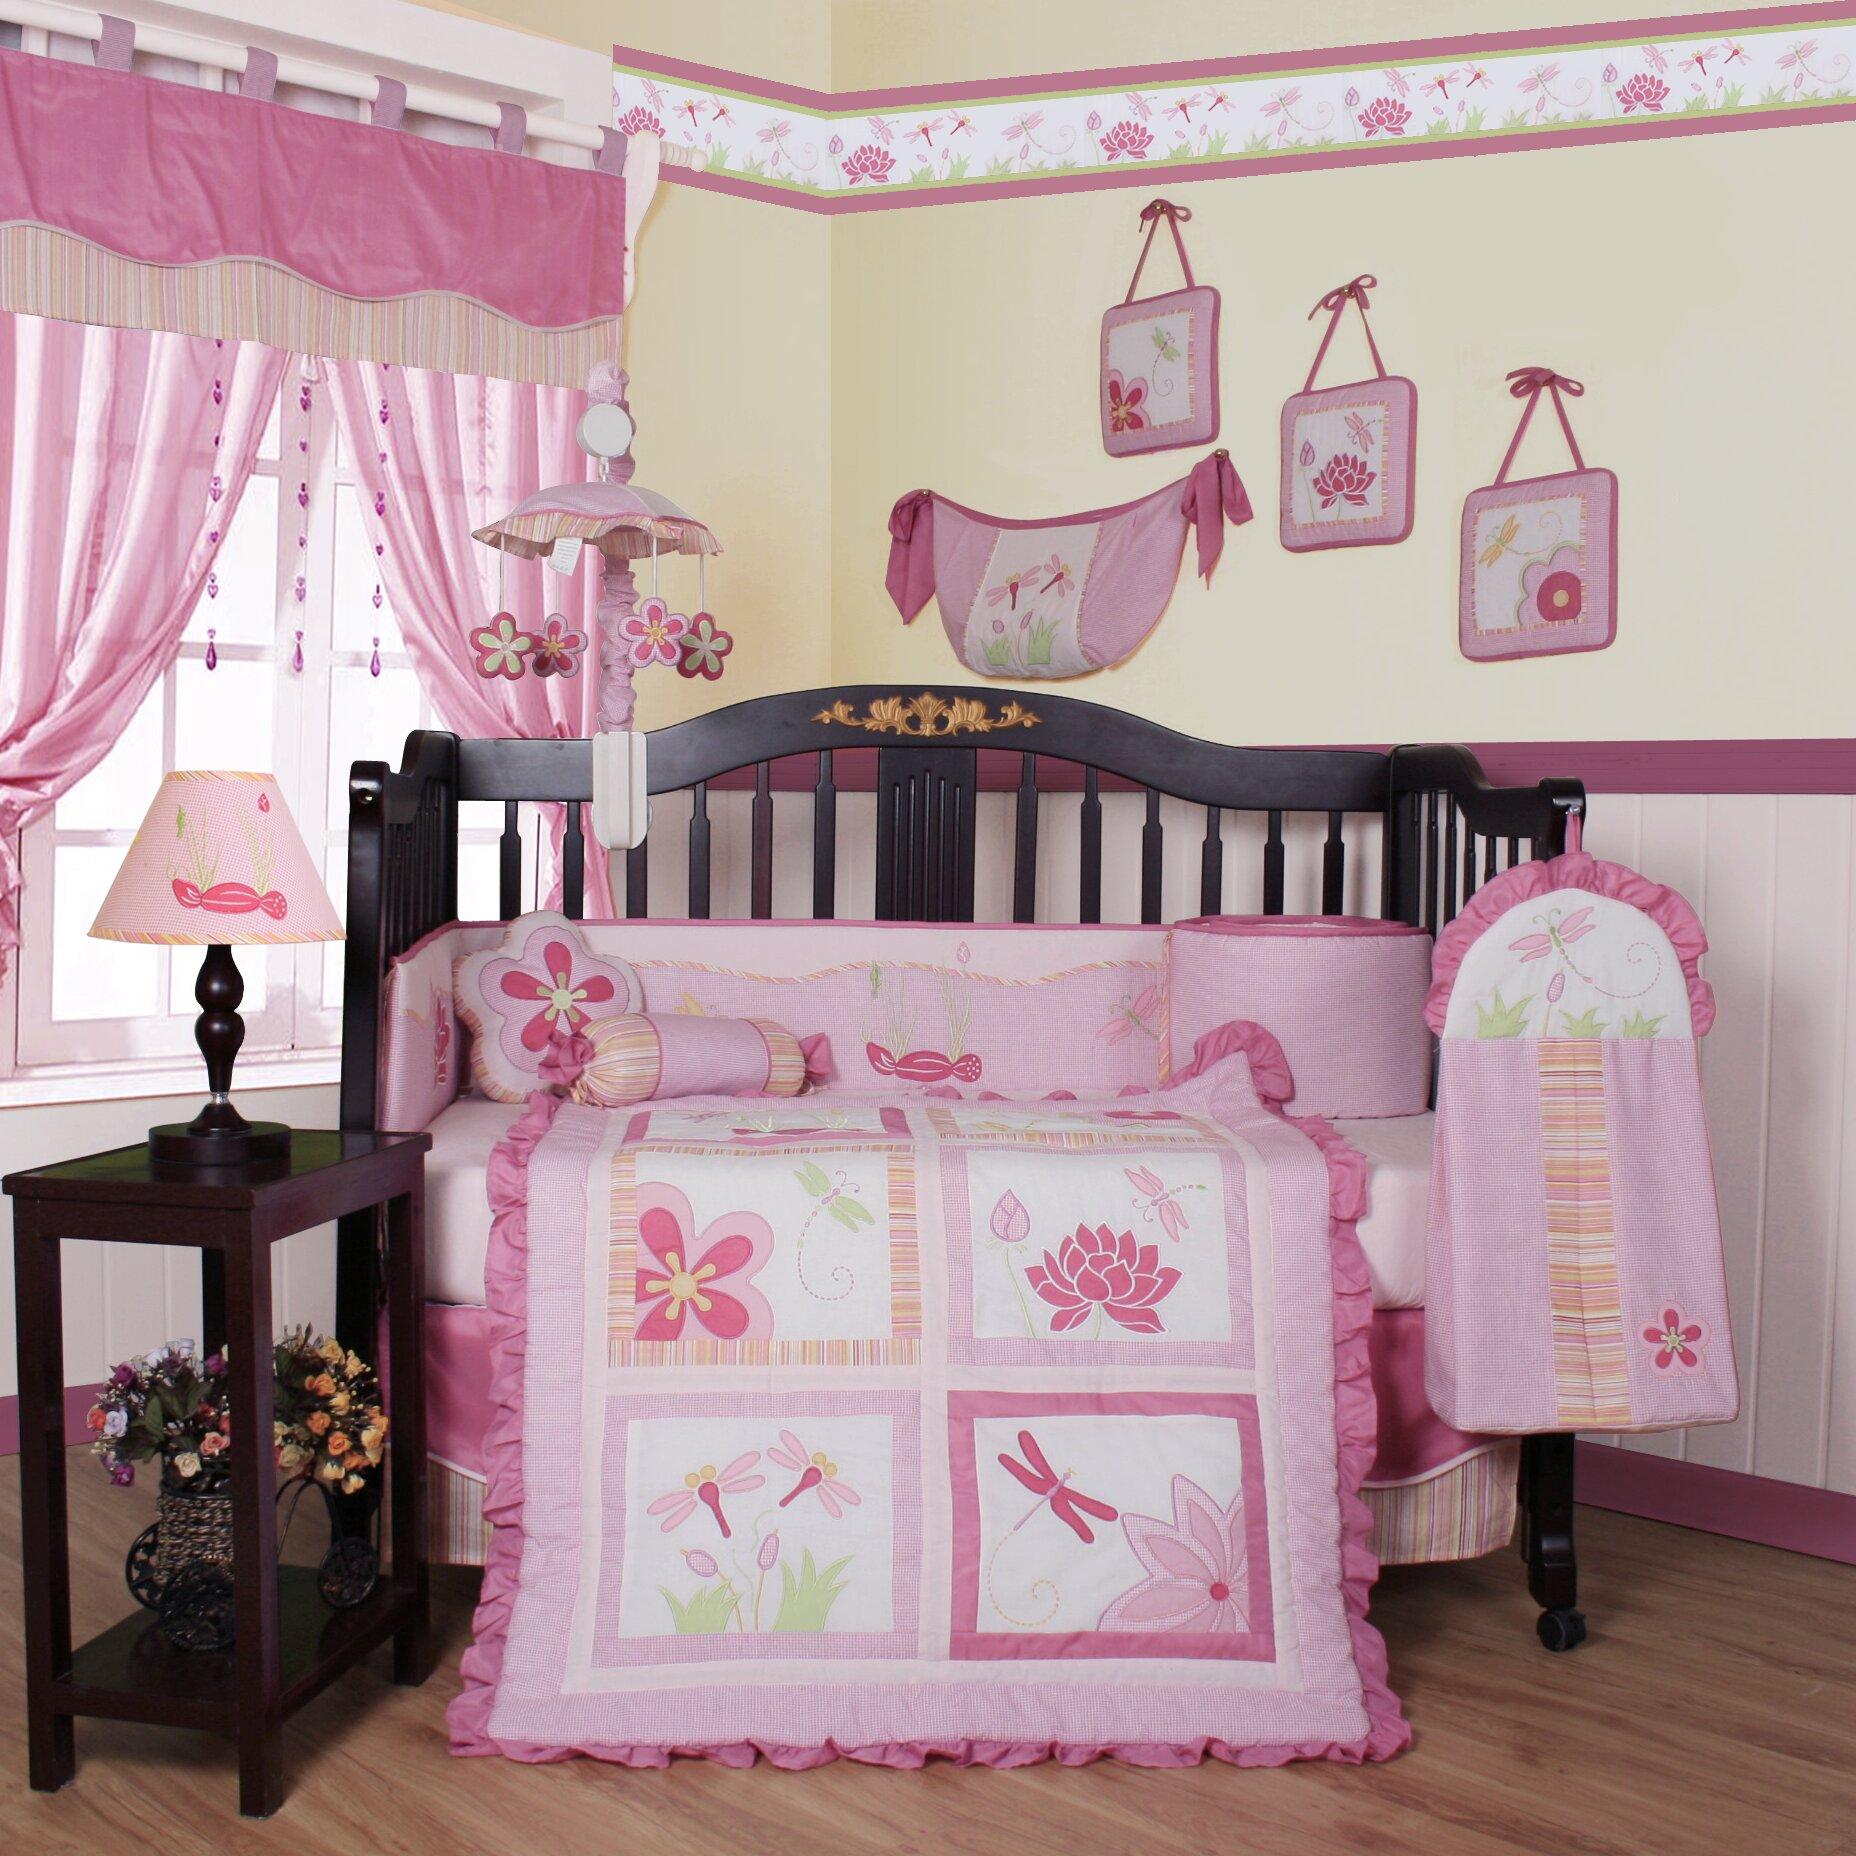 Geenny boutique dragonfly 13 piece crib bedding set reviews wayfair - Geenny crib bedding sets ...